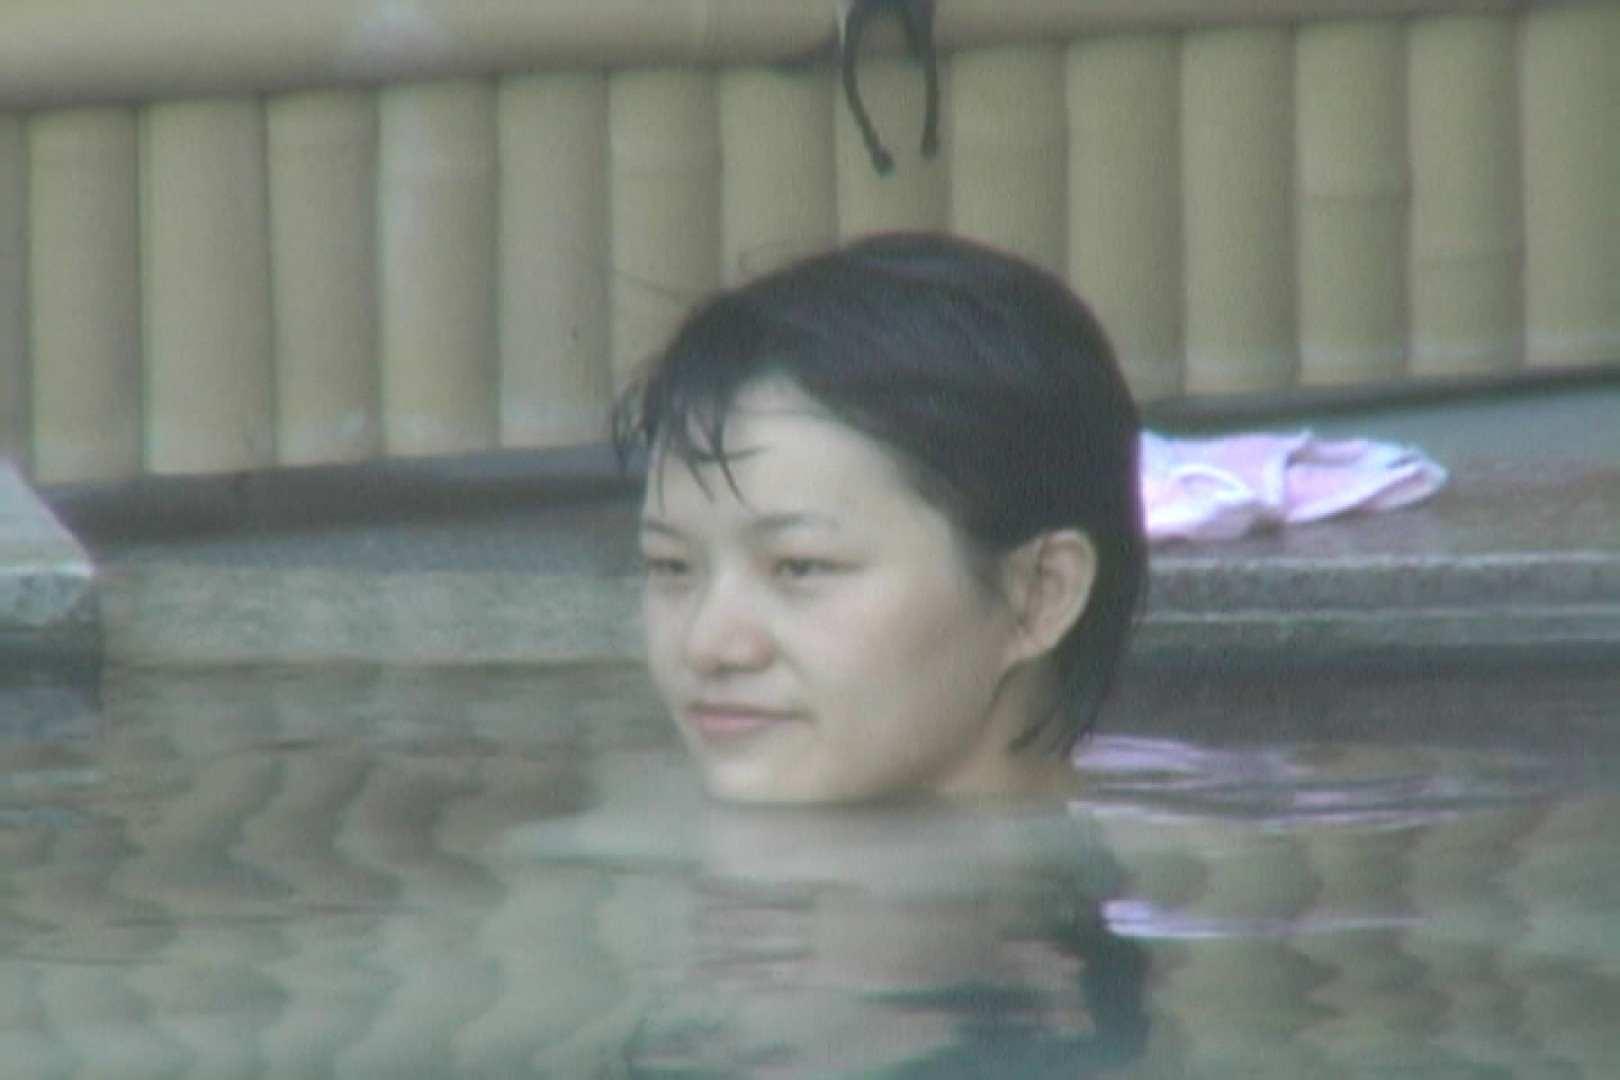 Aquaな露天風呂Vol.116 露天風呂編 | 盗撮シリーズ  107PIX 73